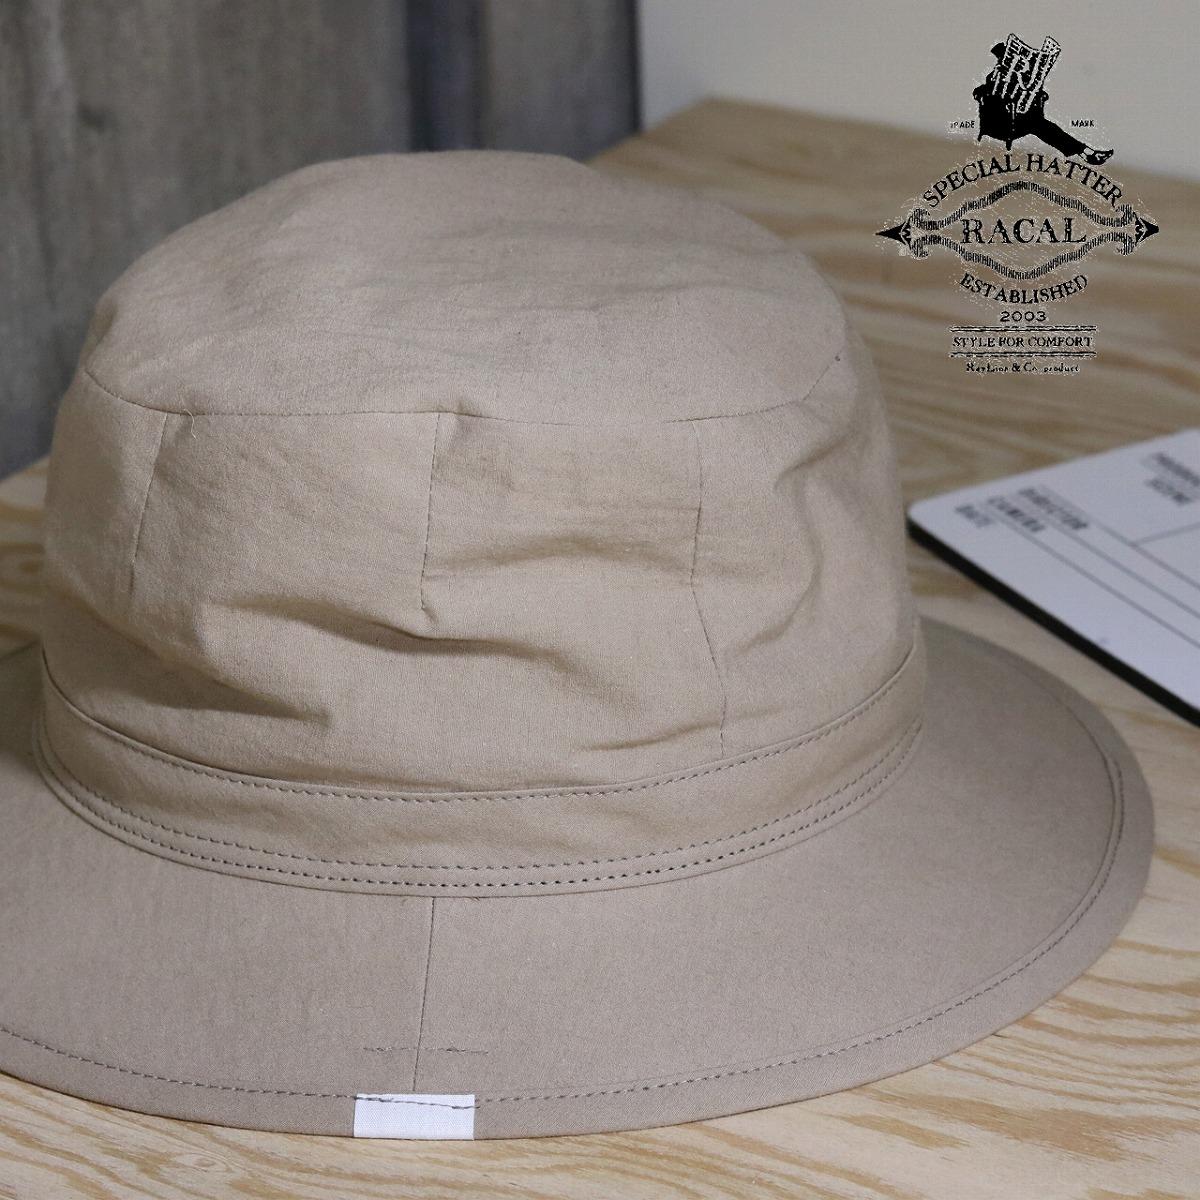 It Is A Gift Present On Shin Pull Sakha Re Hat Beige Bucket Man Birthday Made In Racal Column HAT Cloth Hemp Cotton